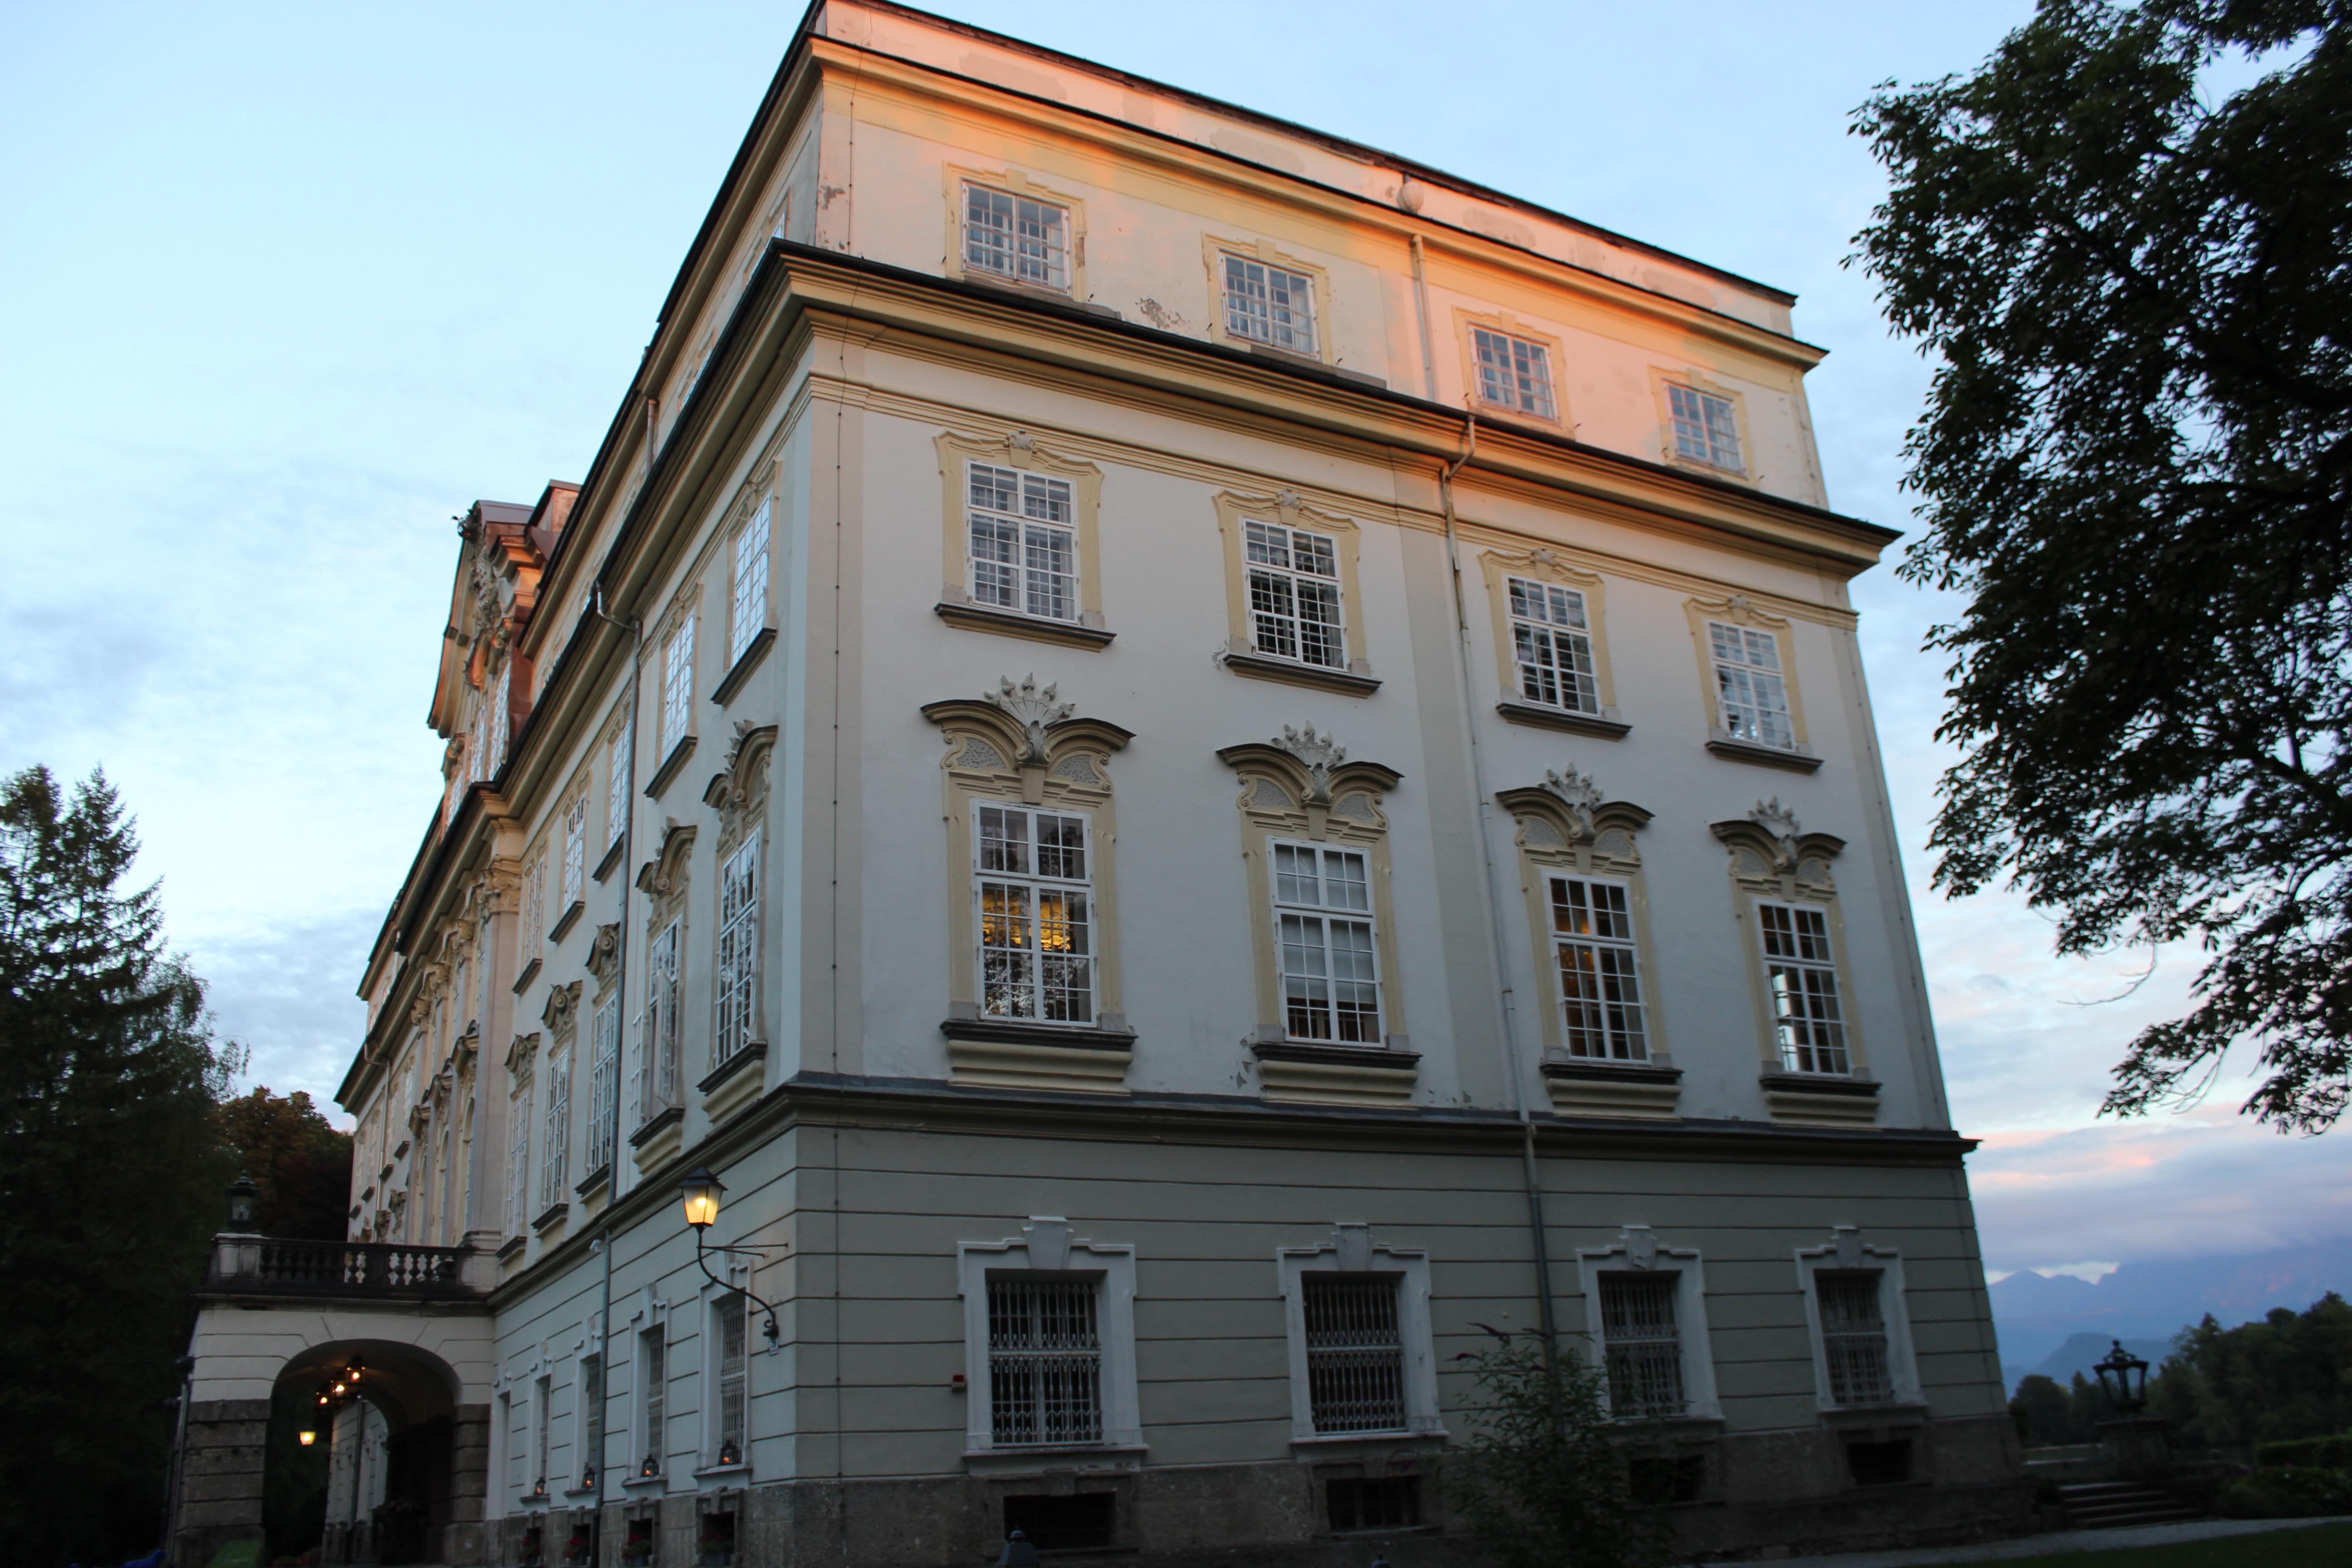 04 - Schloss Leopoldskron, Salzburg